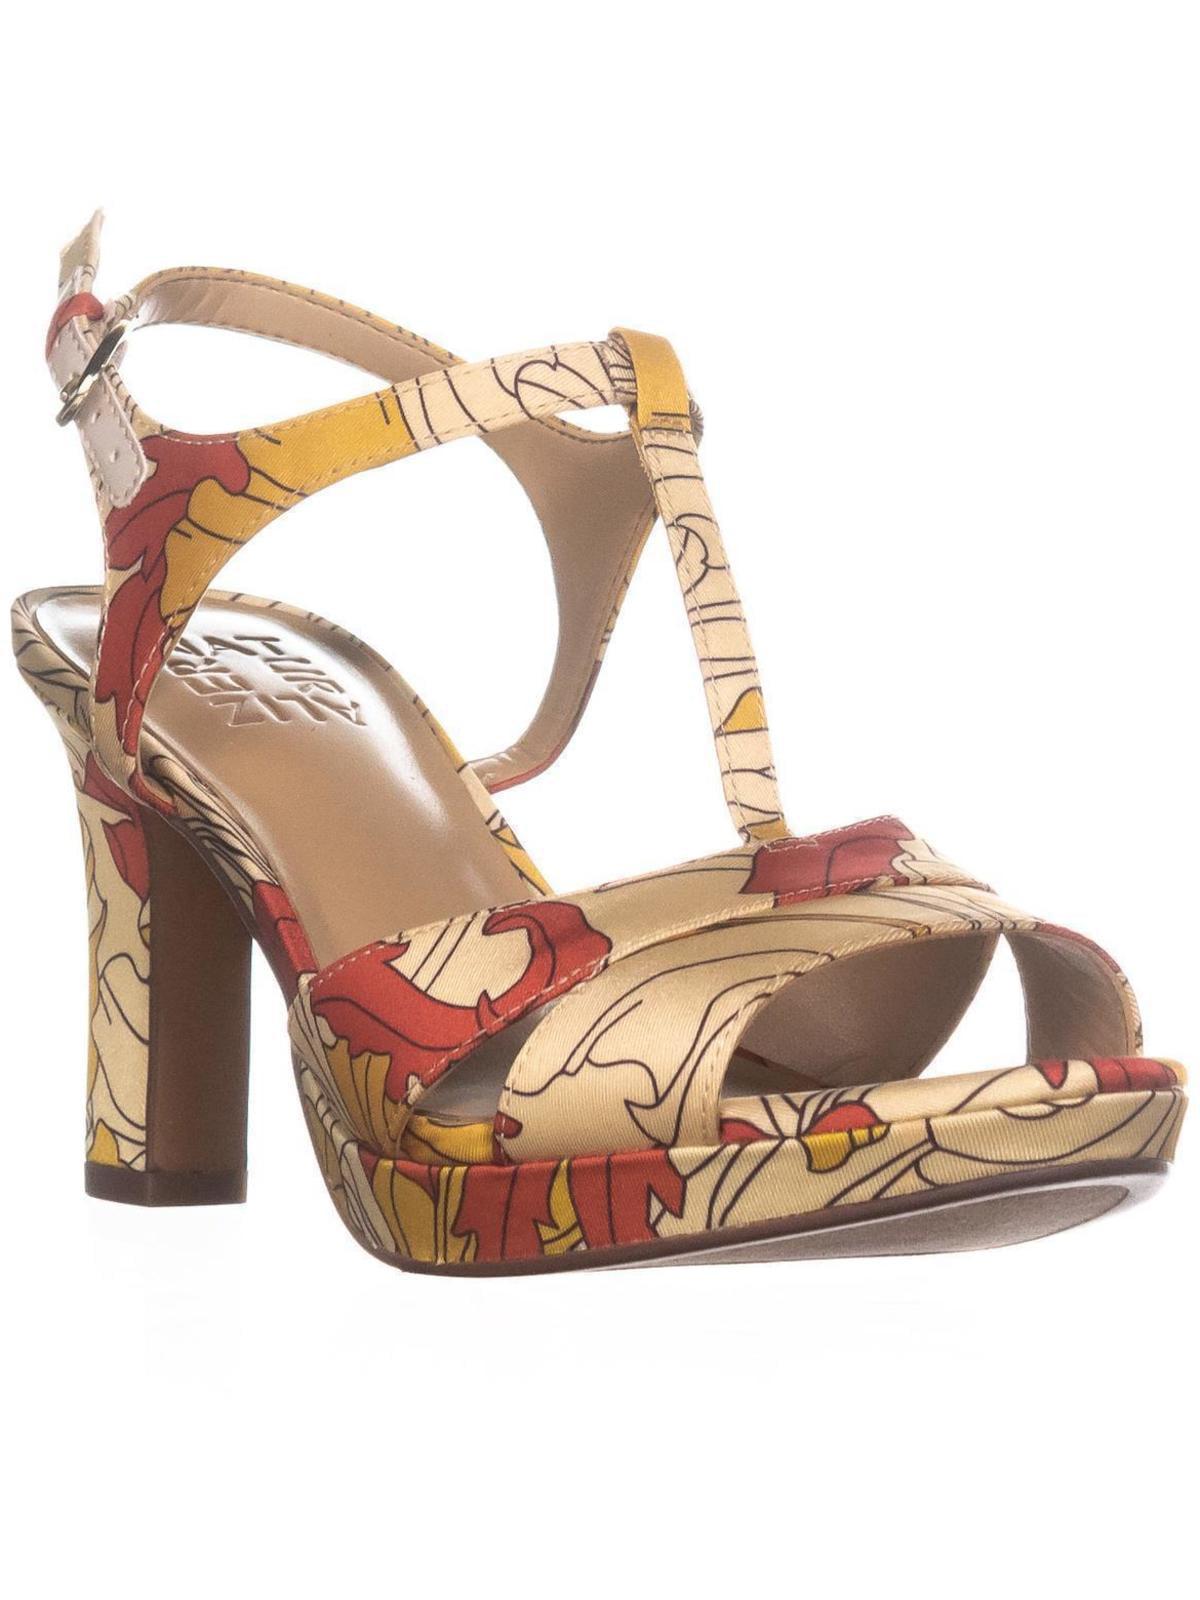 Womens Naturalizer Finn Ankle Strap Heeled Sandals, Papaya Print by Naturalizer